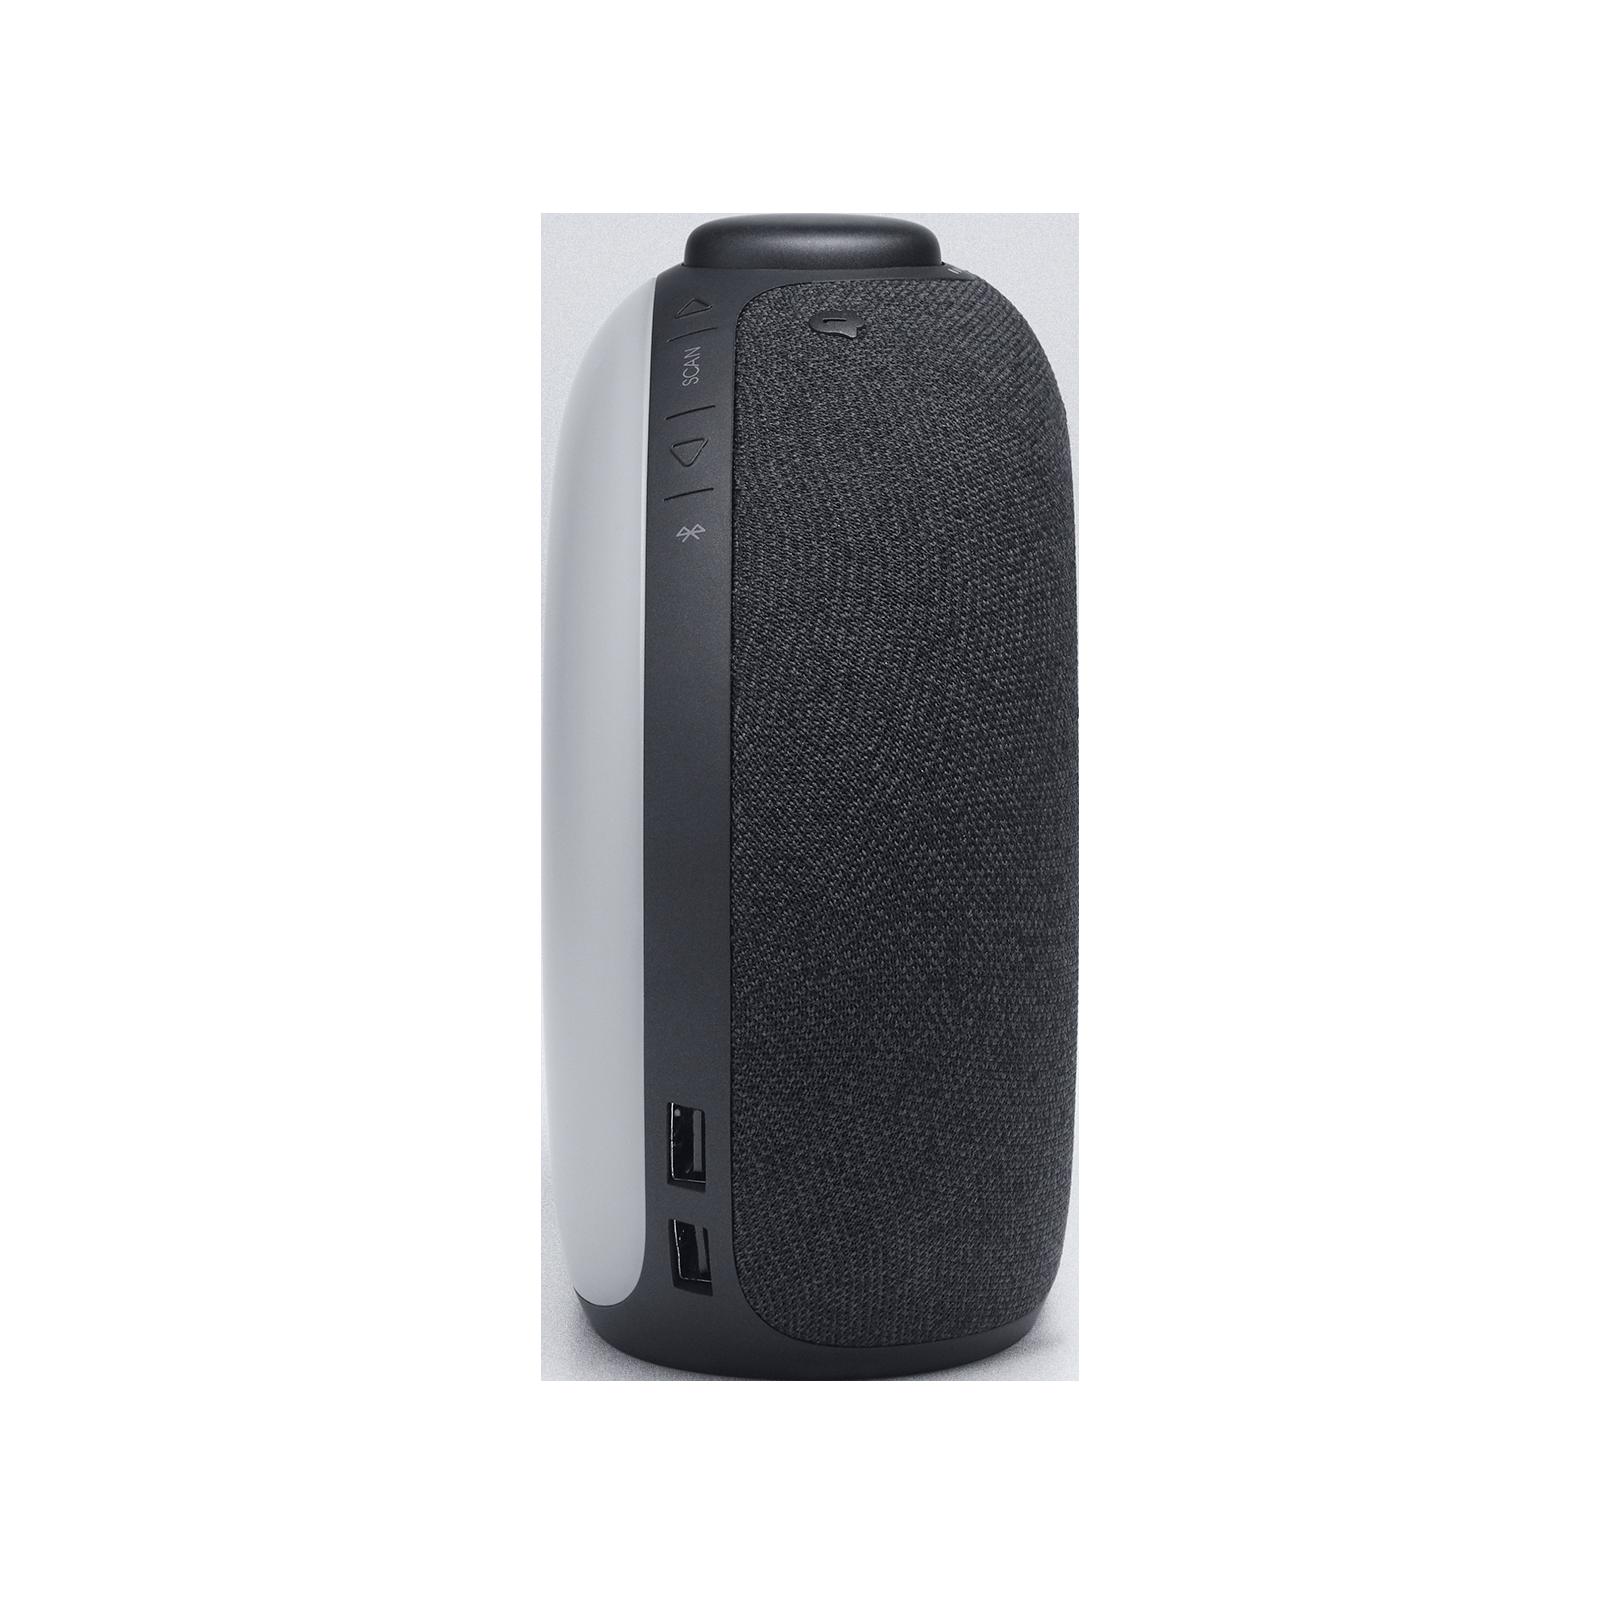 JBL Horizon 2 DAB - Black - Bluetooth clock radio speaker with DAB/DAB+/FM - Right